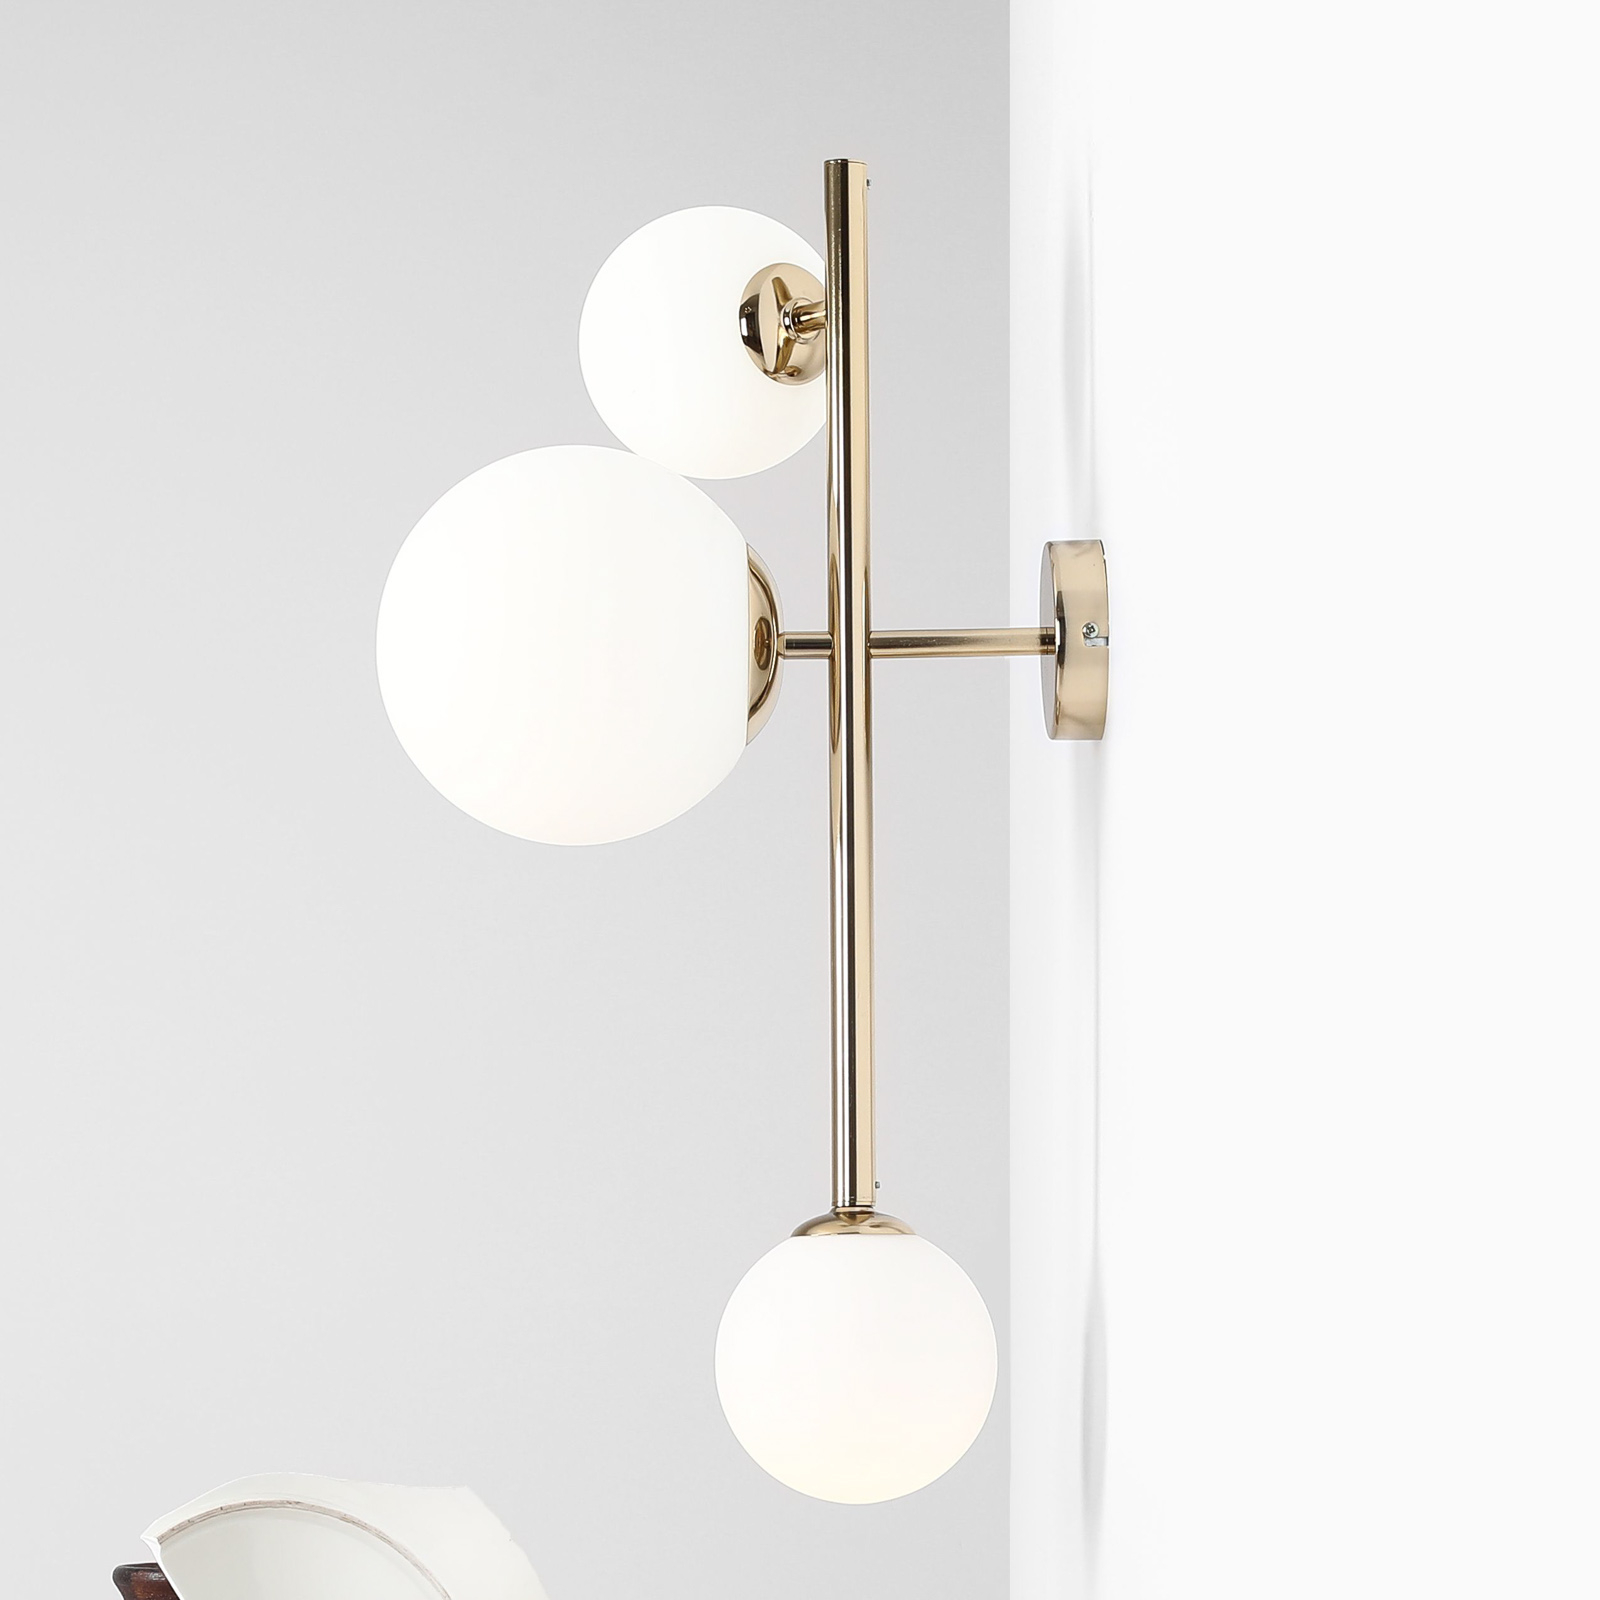 Vegglampe Dione, 3 lyskilder, gull